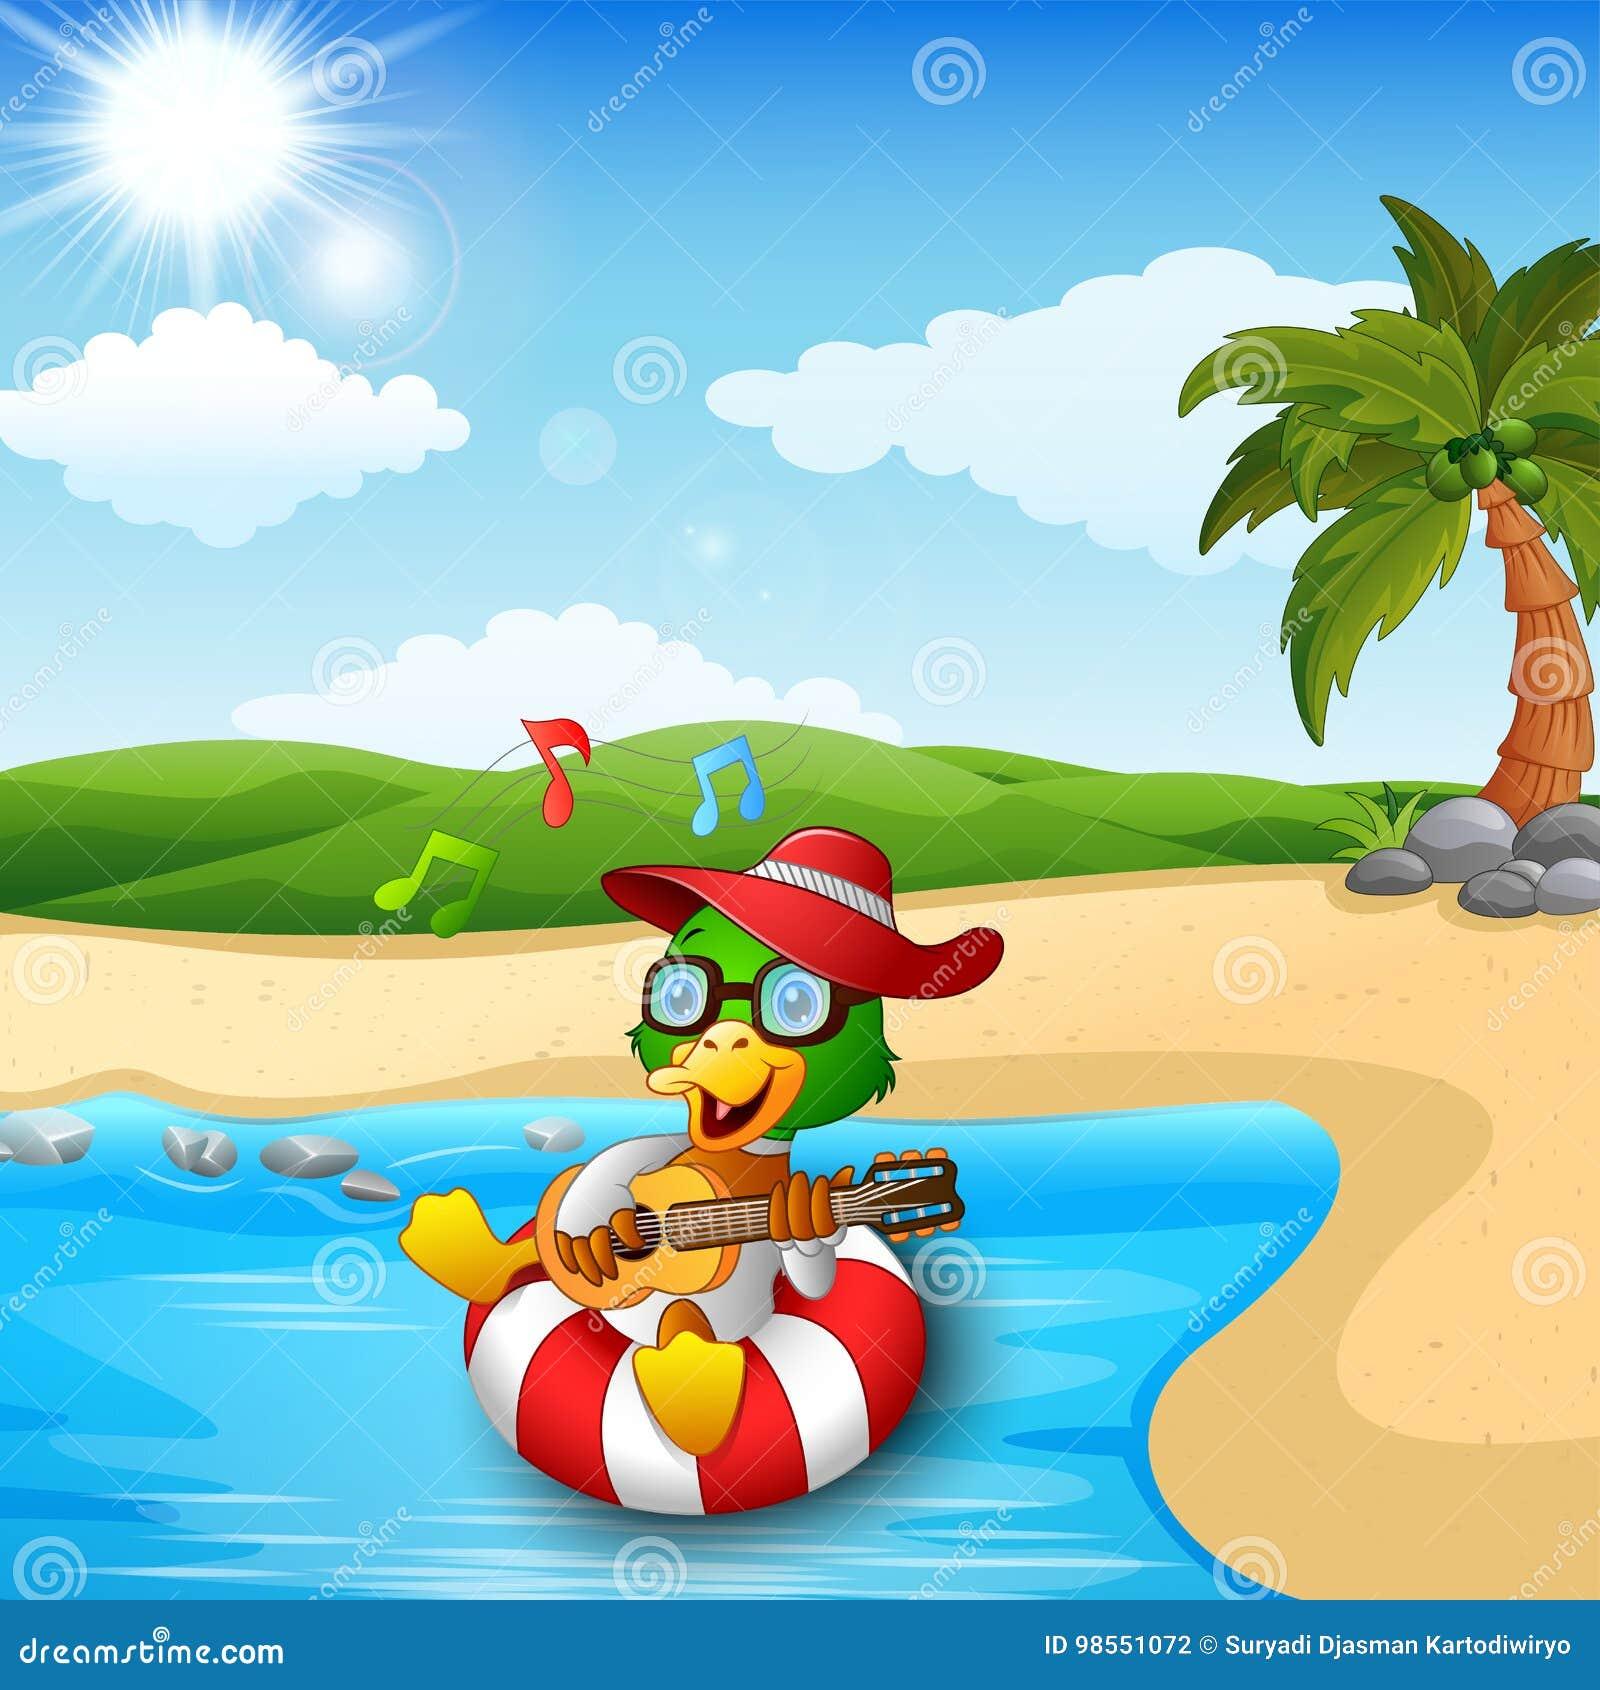 Duck Cartoon Enjoy Playing Guitar And Singing On Beach